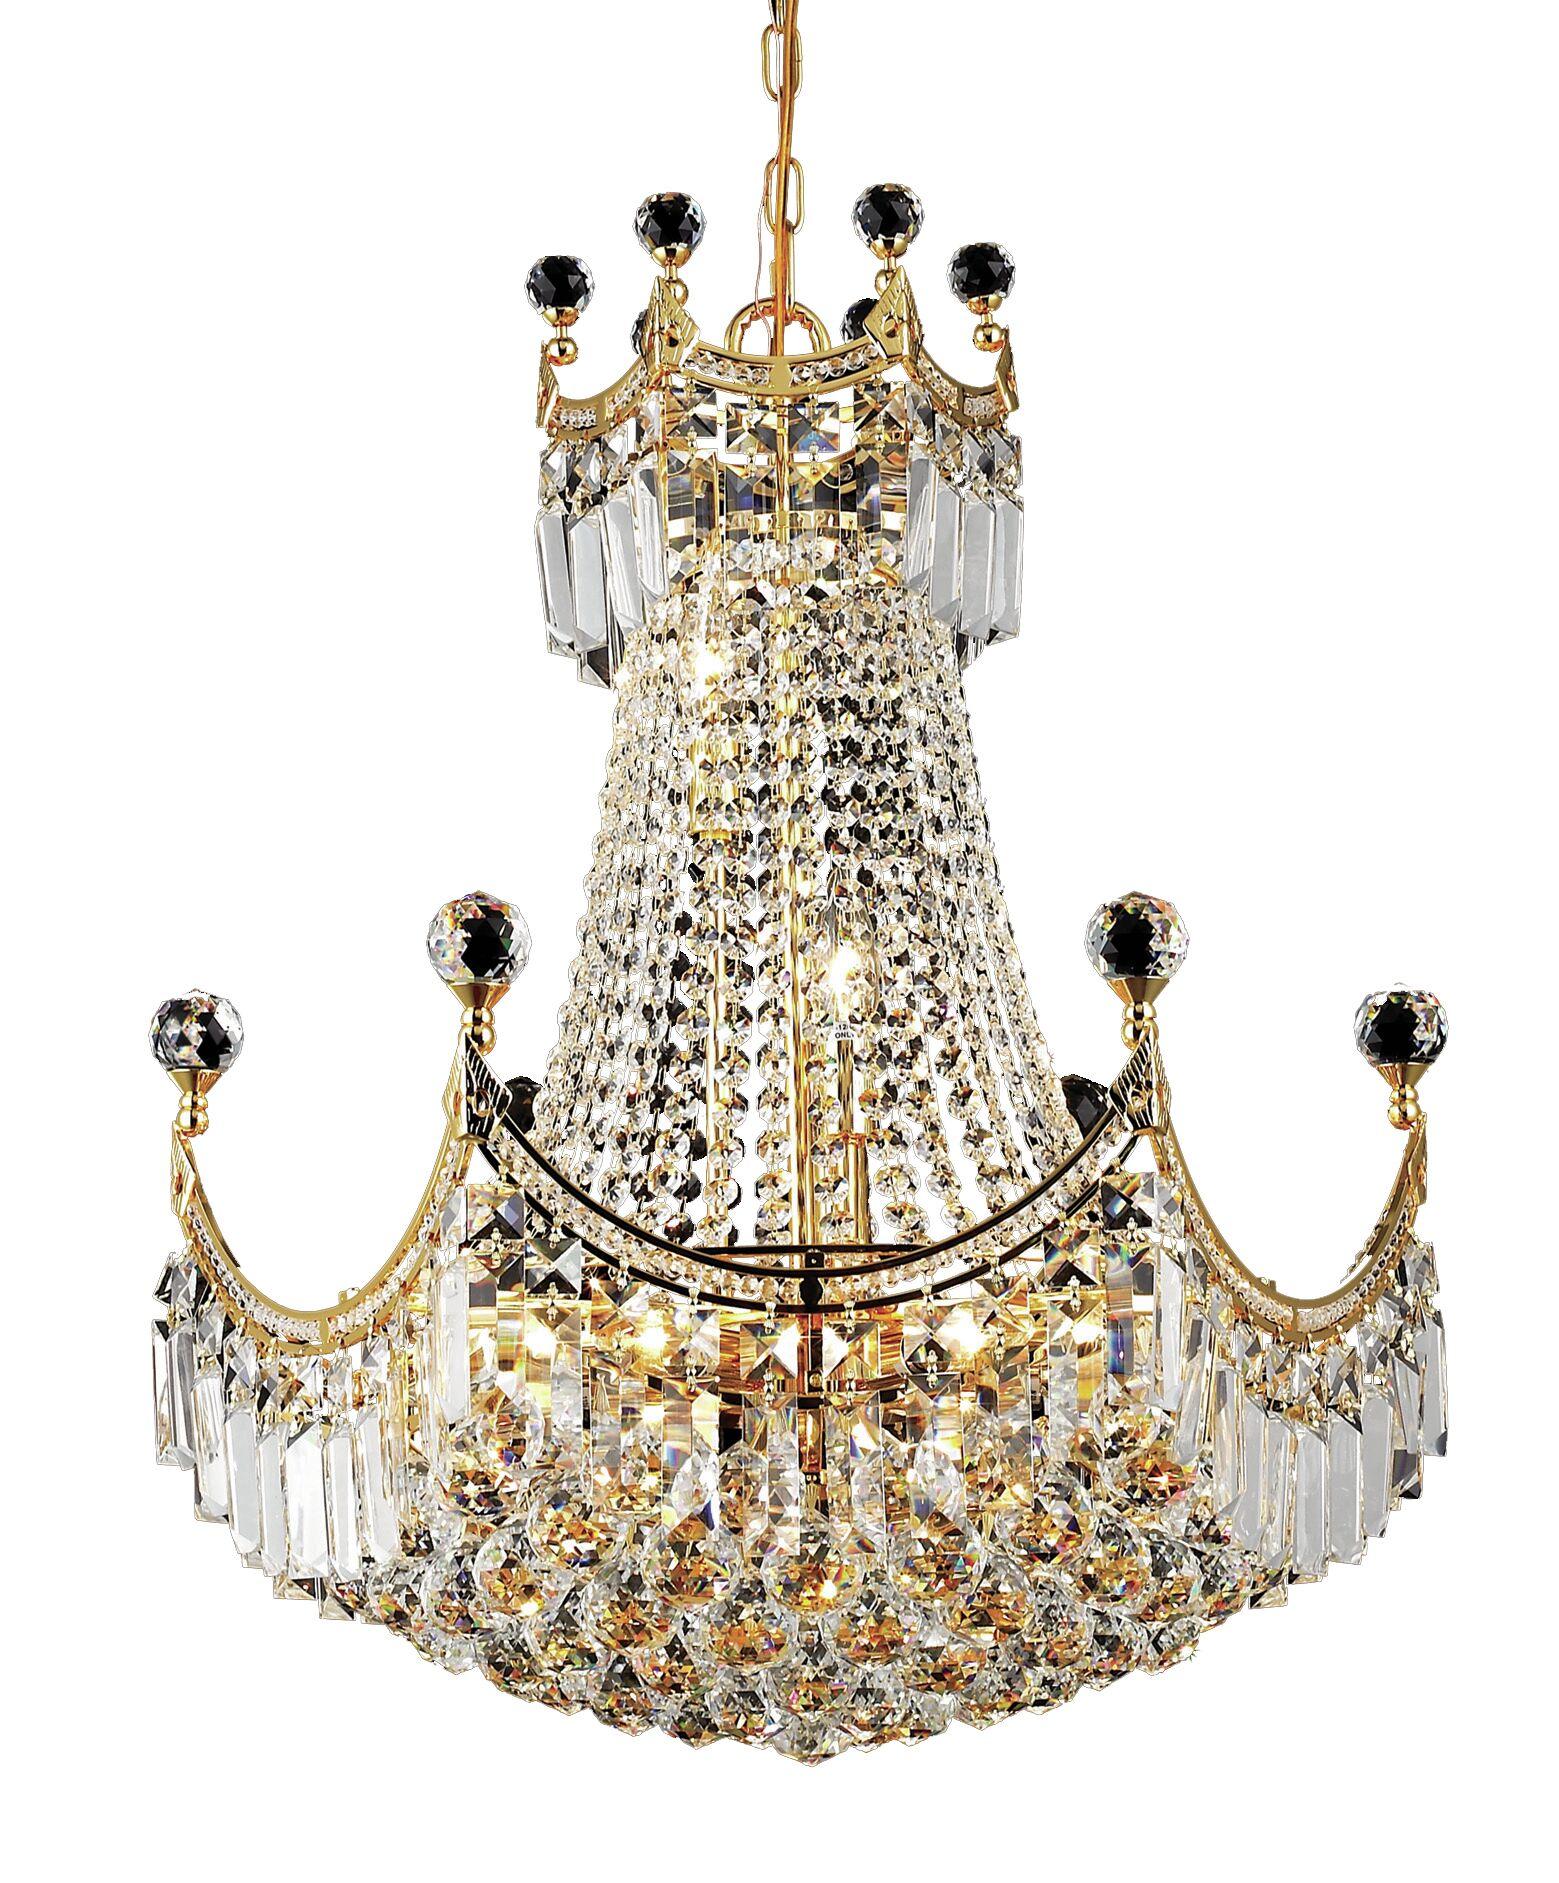 Kasha 9-Light Chandelier Finish: Gold, Crystal: Spectra Swarovski